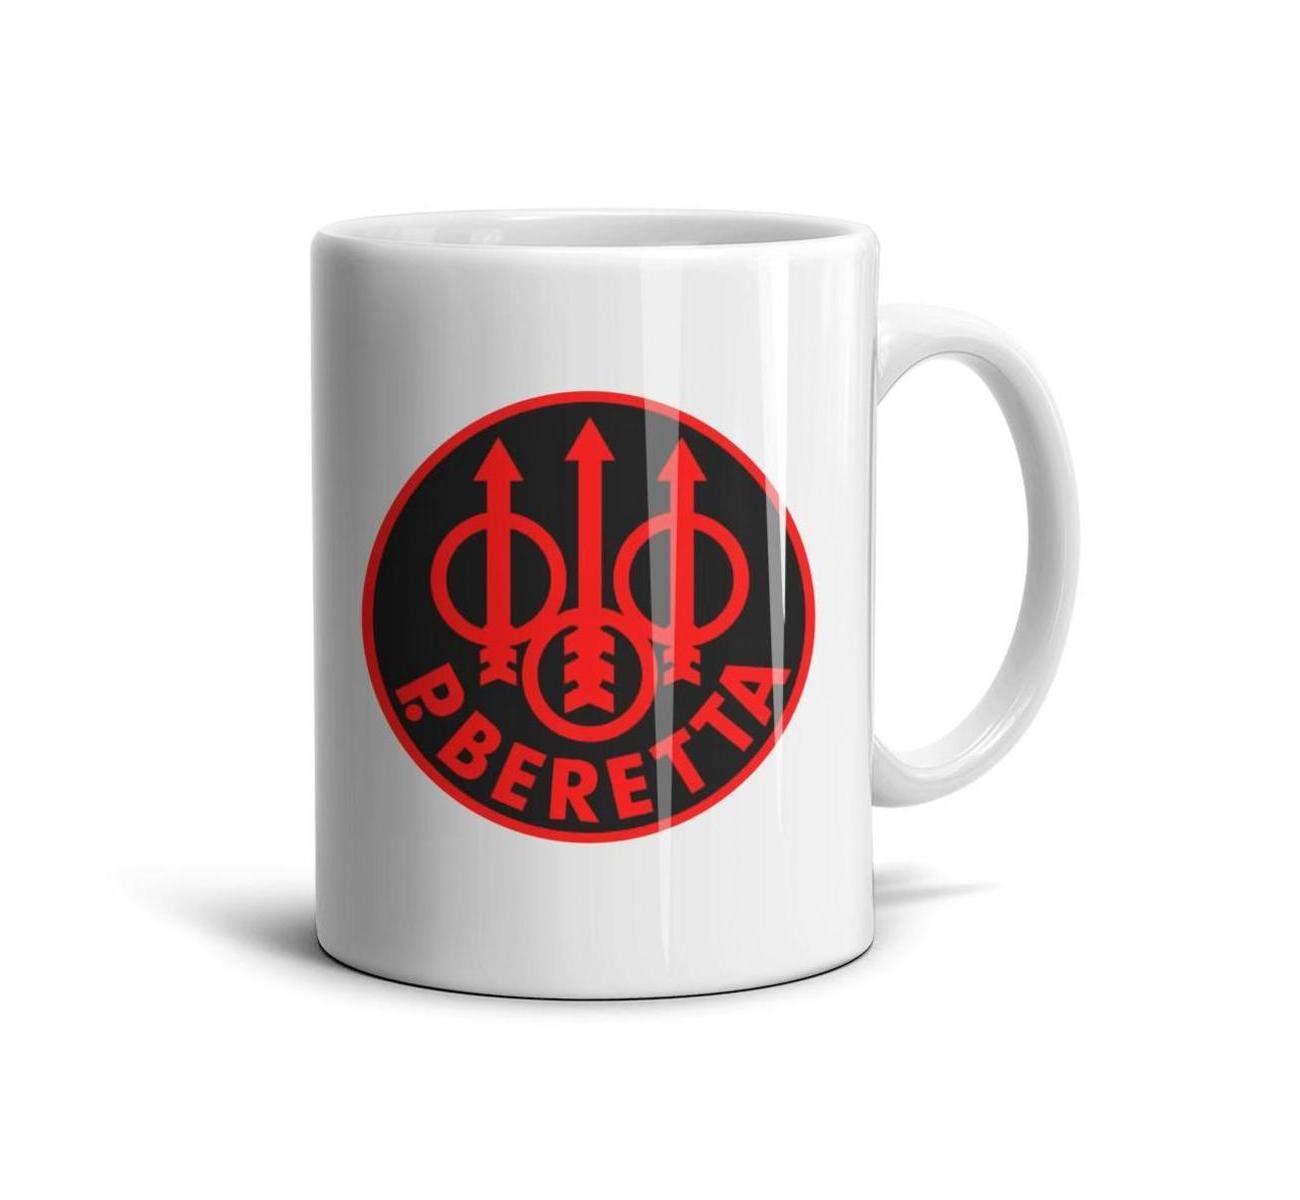 HIYITUTA P. Beretta Logo Coffee Mugs Novelty Daily Use Mug 11 Oz Best Friend Mugs Boyfriend Women